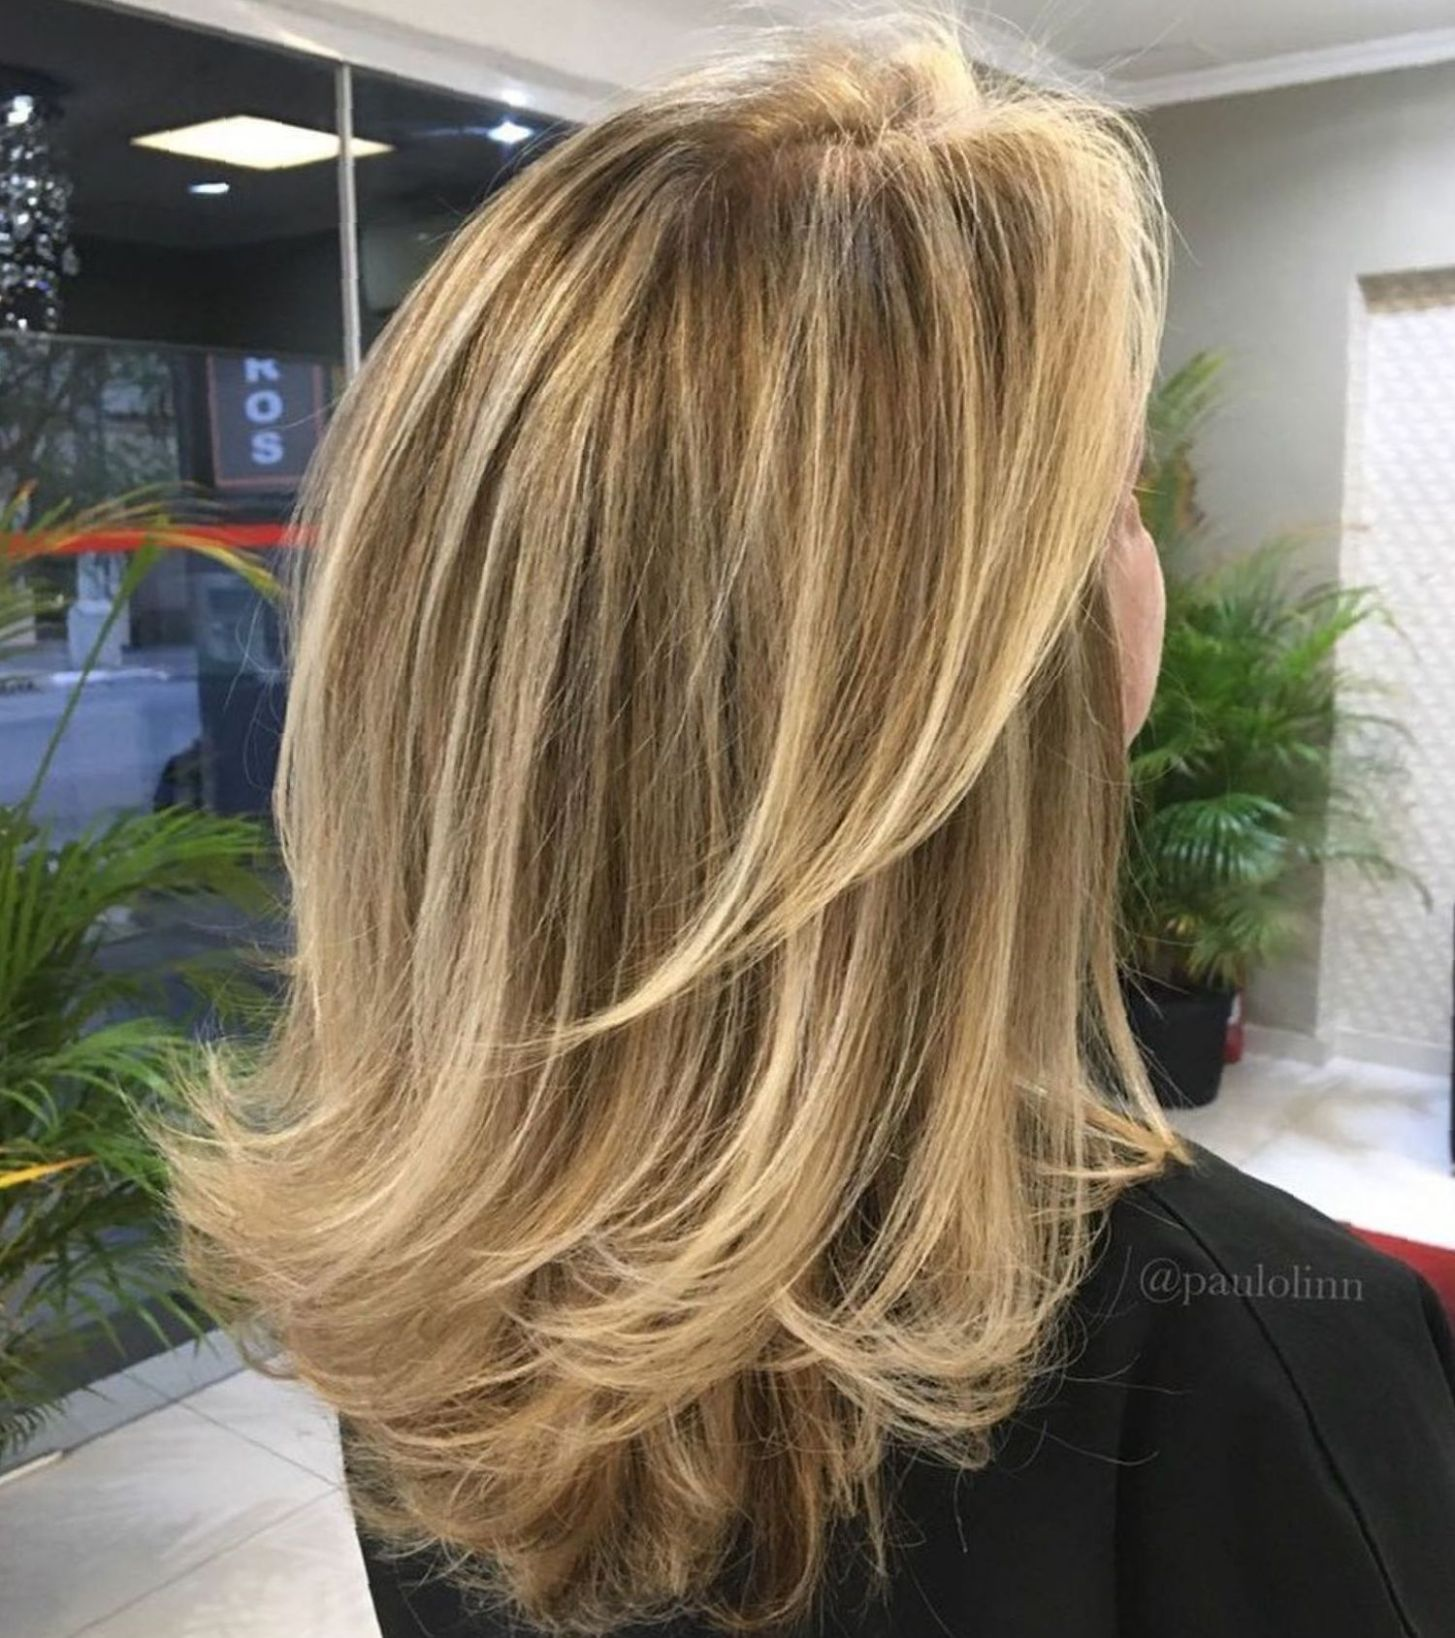 50+ Medium length hairstyles for fine hair over 60 ideas in 2021